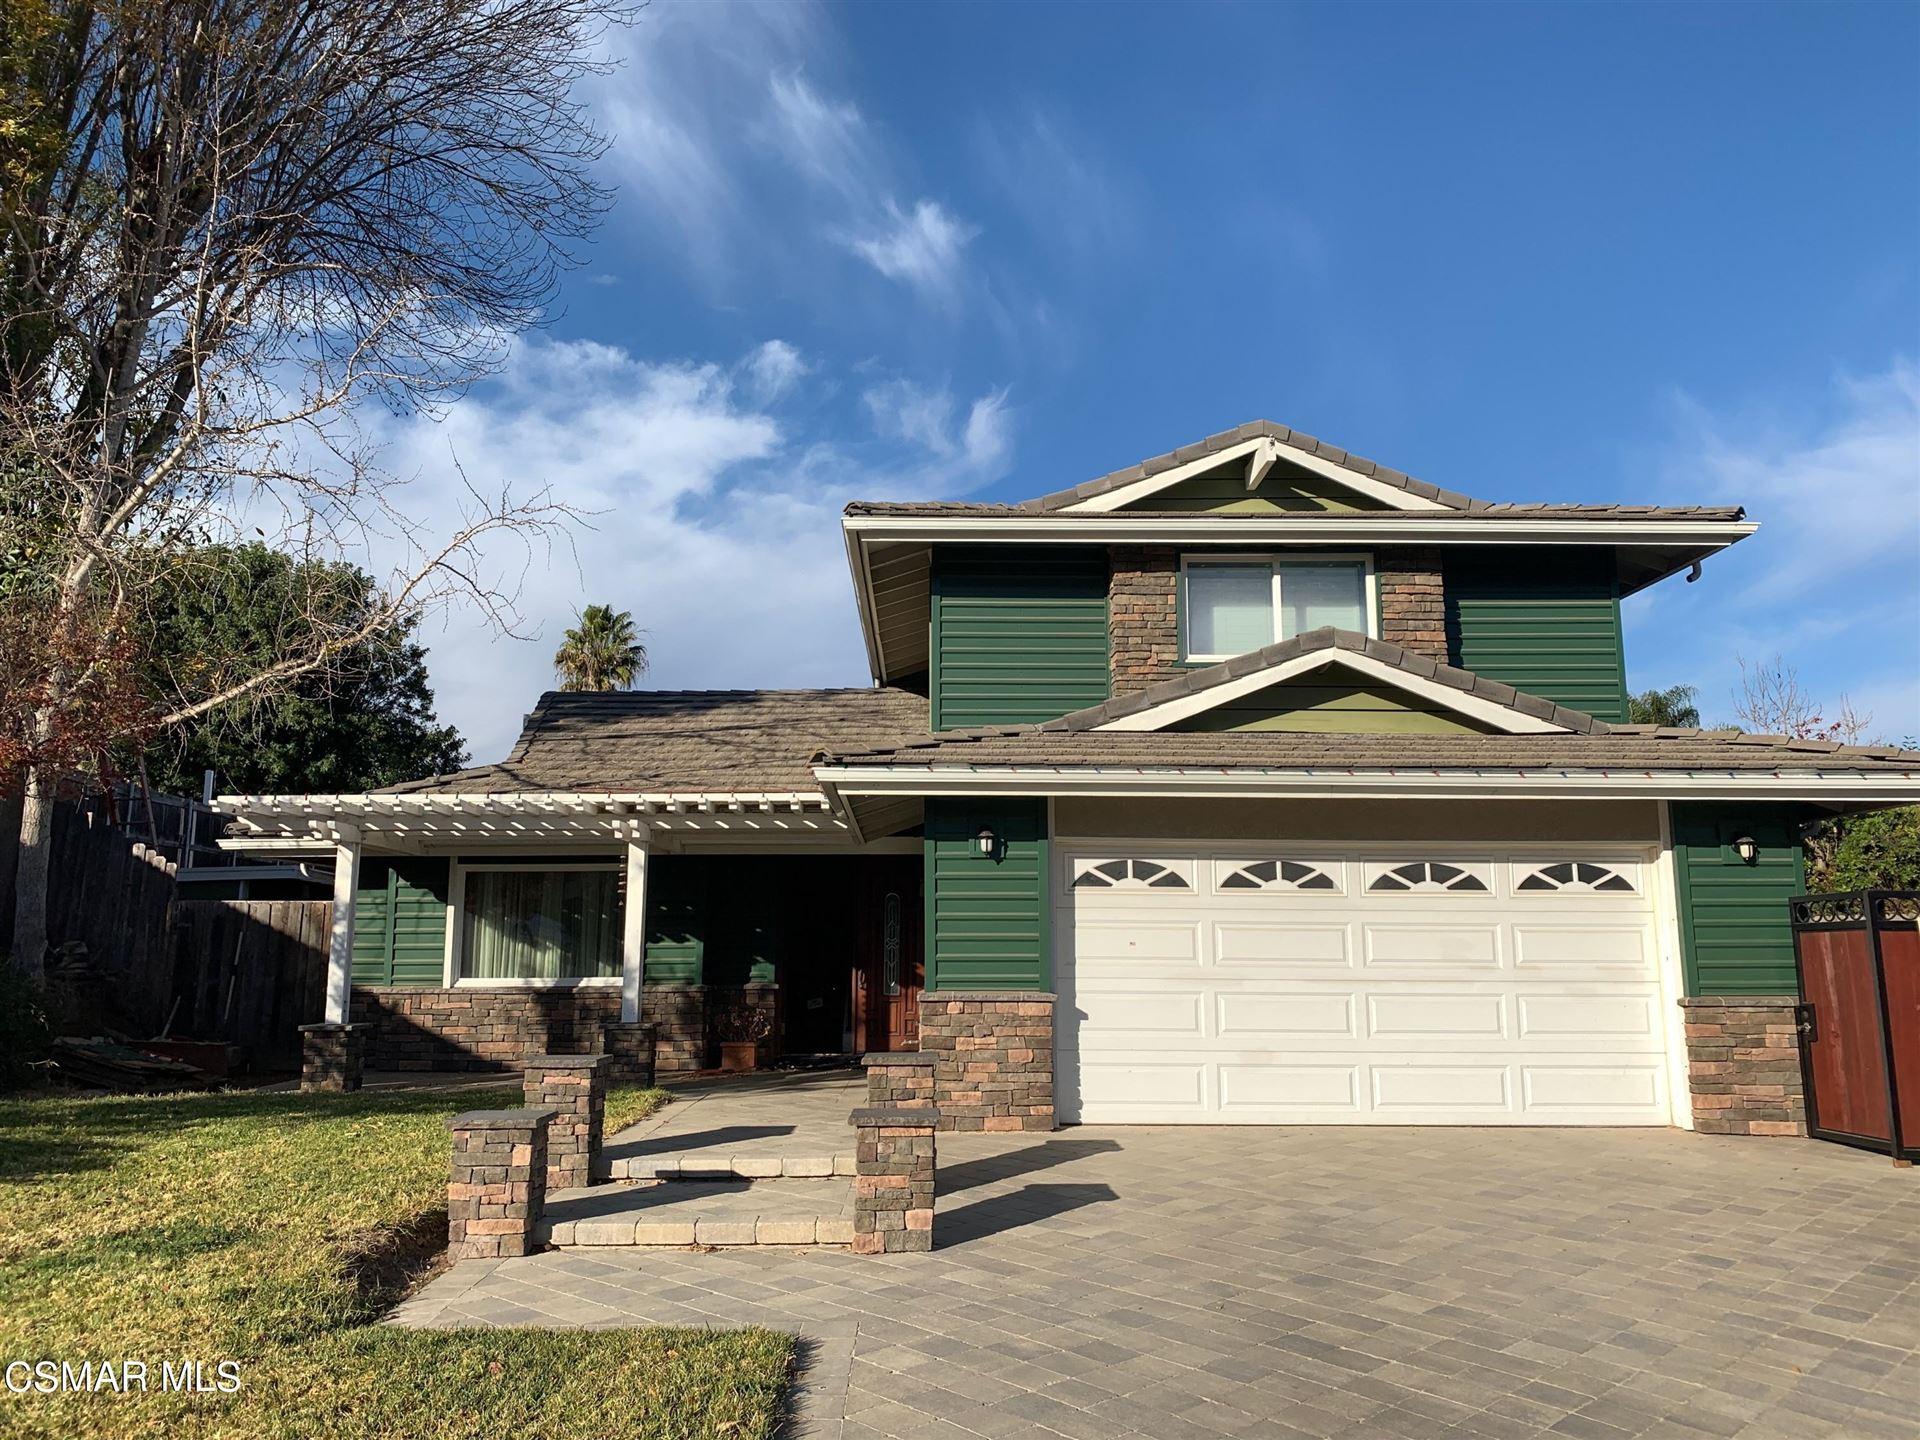 3859 Mayfield Street, Newbury Park, CA 91320 - MLS#: 220011496